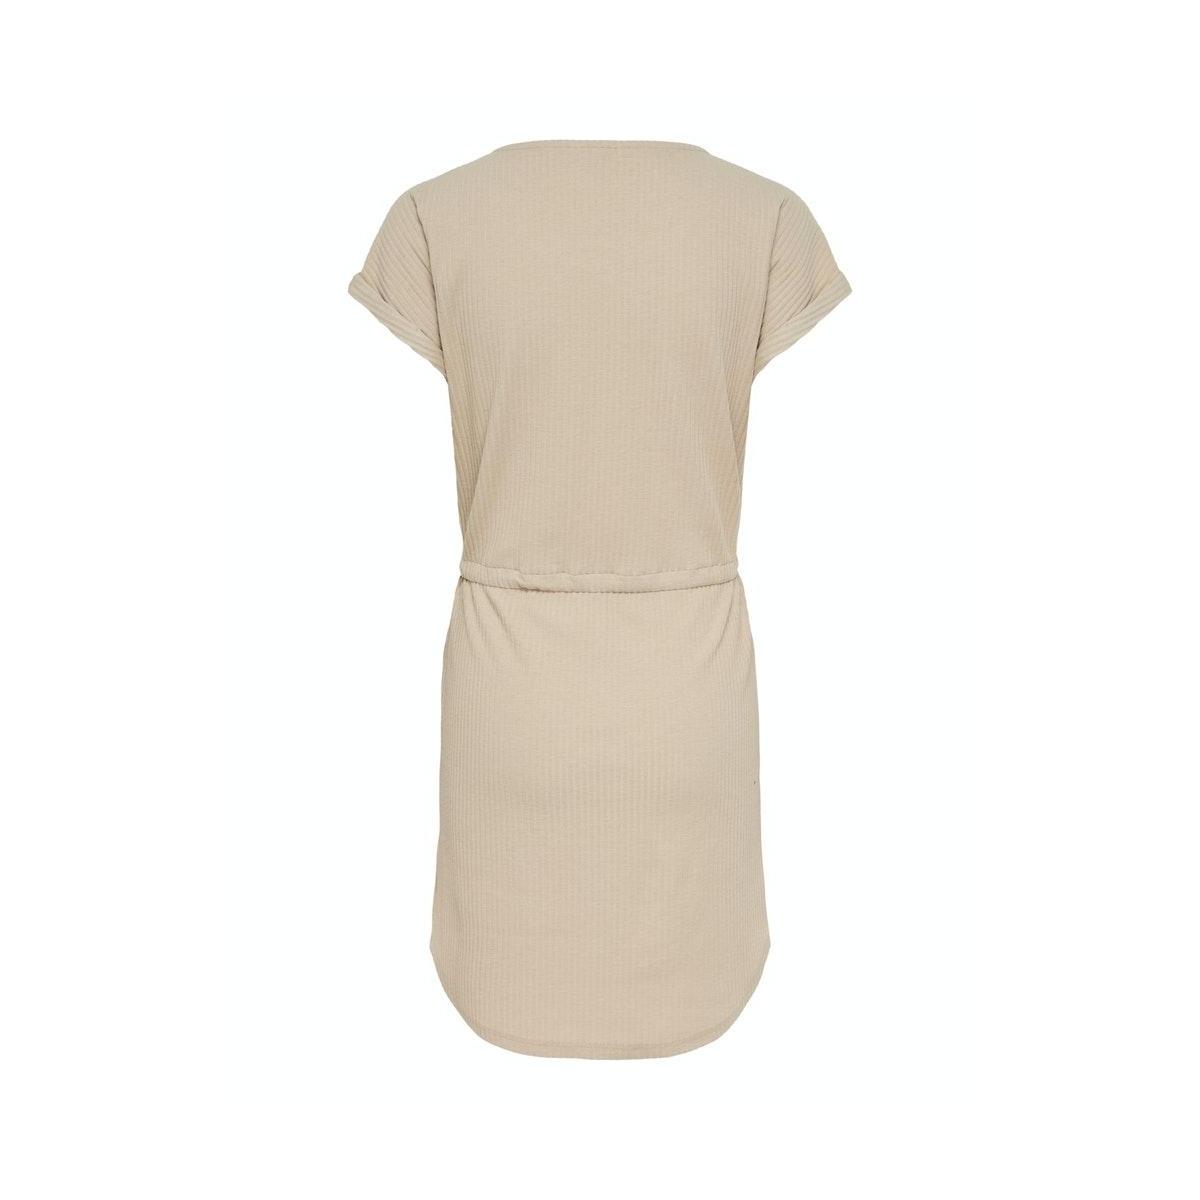 onljulia s/s string dress jrs 15216695 only jurk feather gray